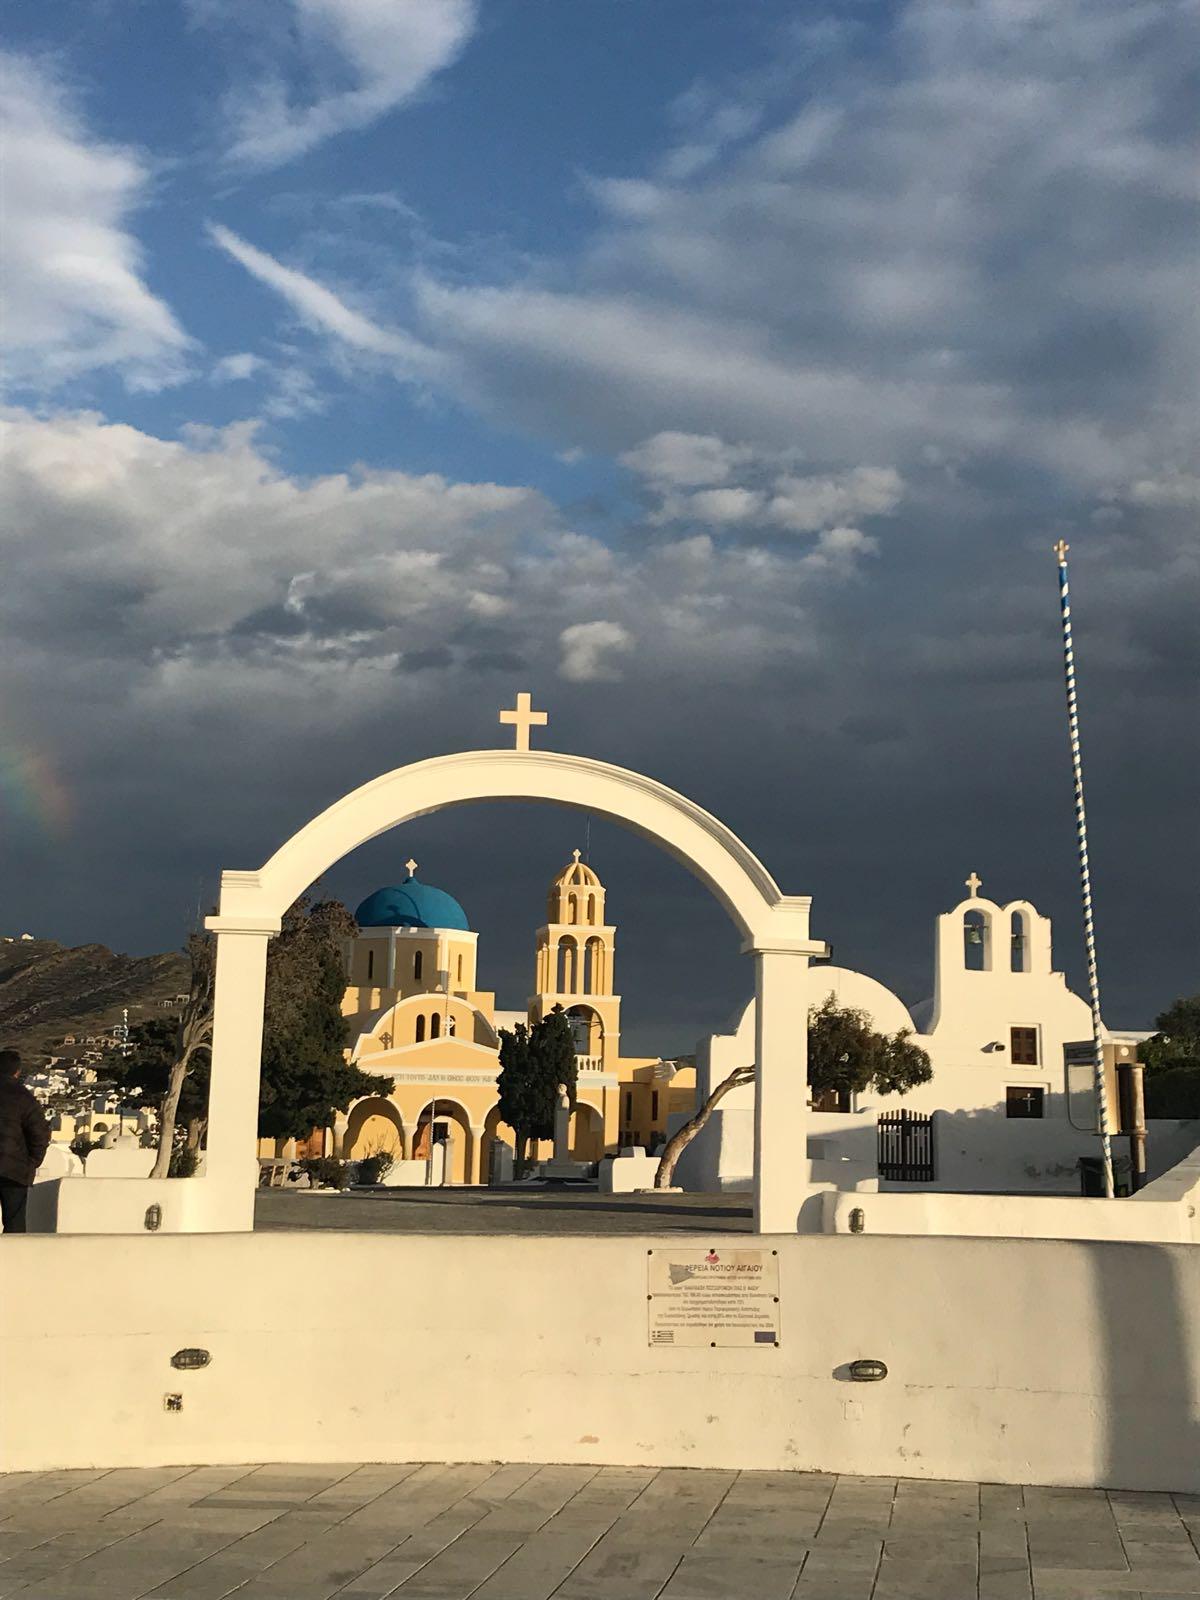 Light ochre church in Santorini at sunset, viewed through a white arch